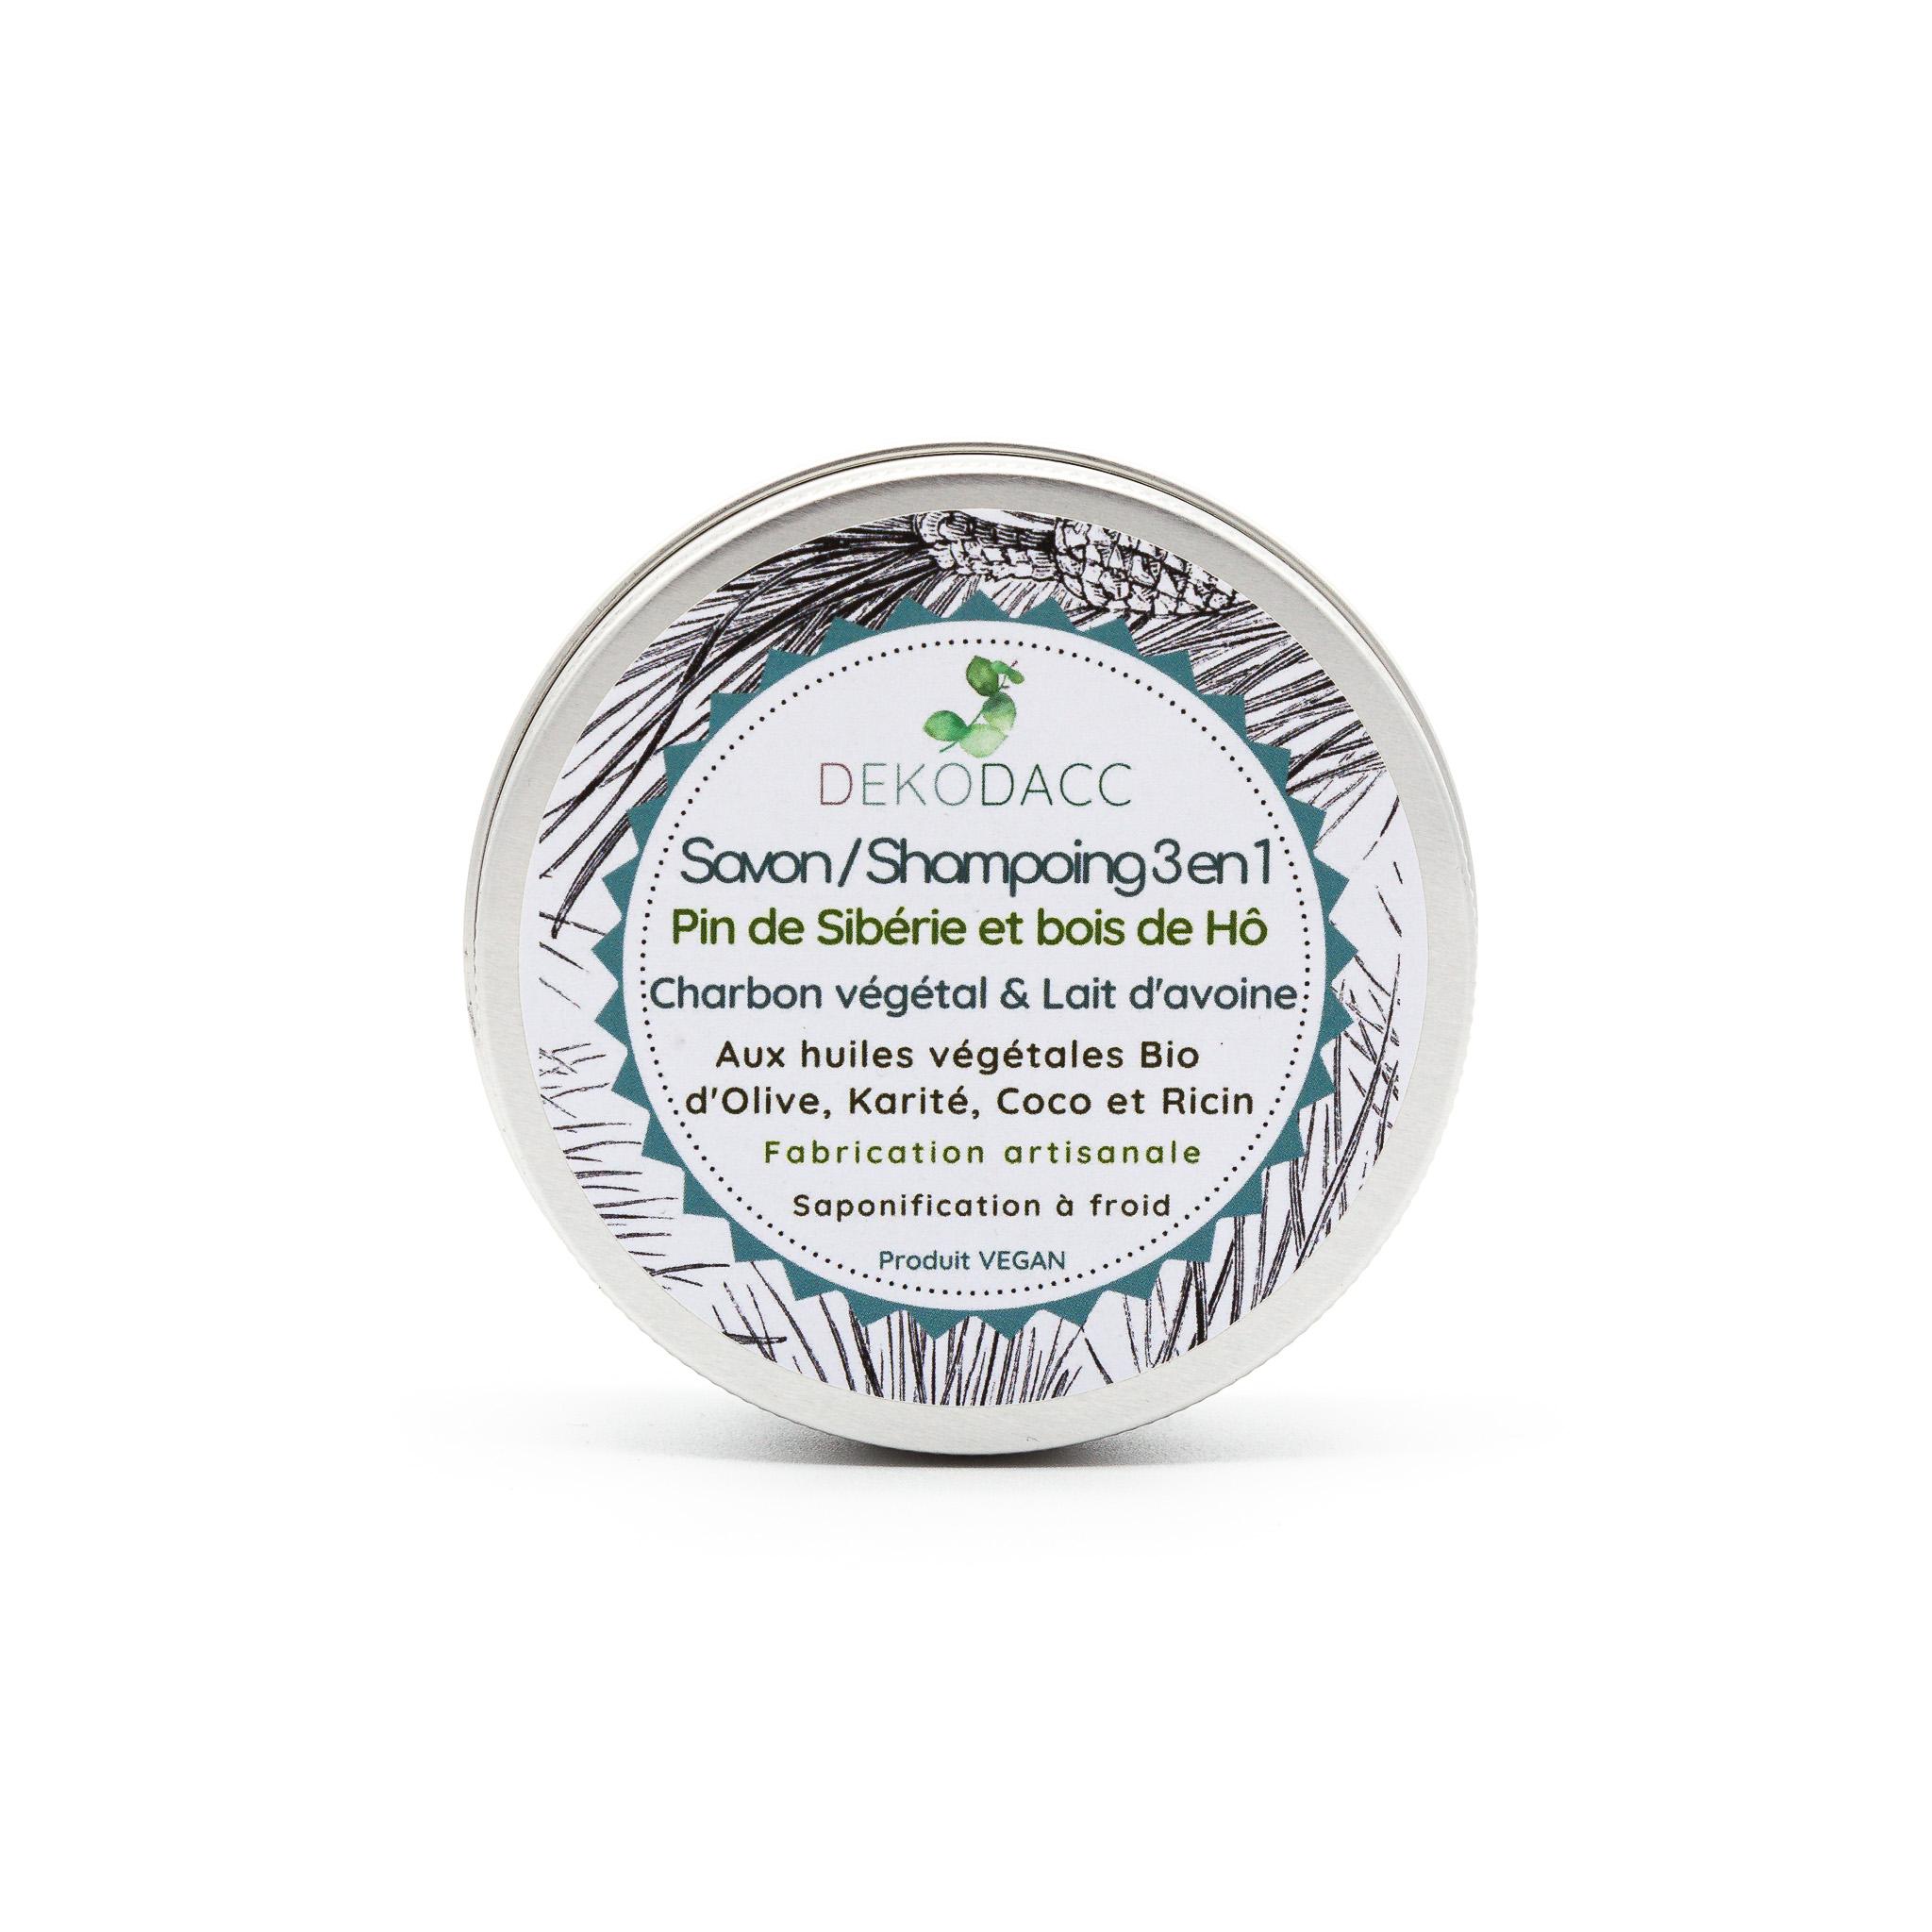 Savon naturel dekodacc 3 en 1 corps, cheveux, rasage vegan